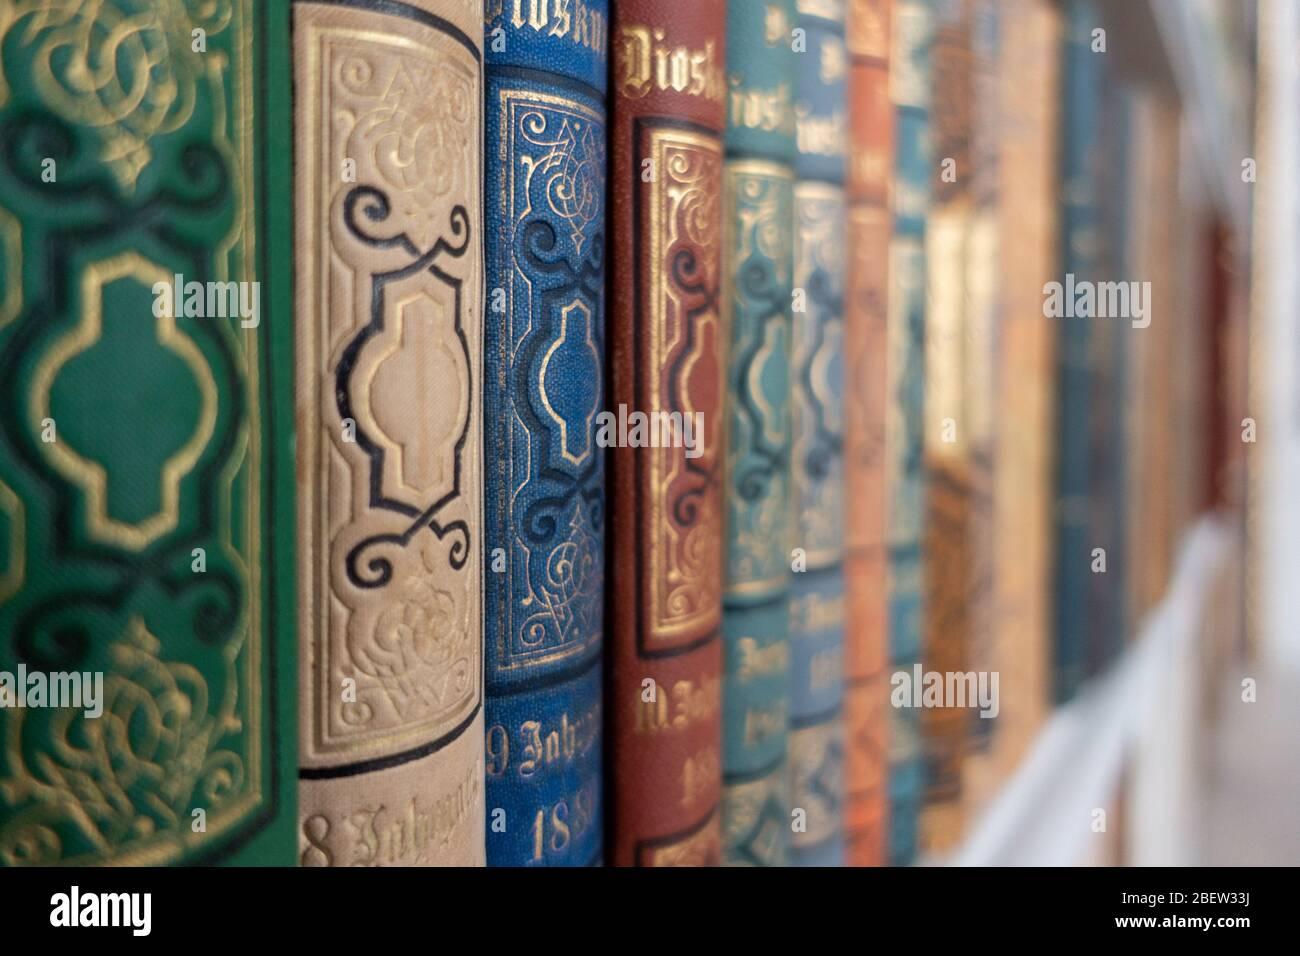 HISTORISCHE BÜCHER . HISTORIC BOOKS Stock Photo